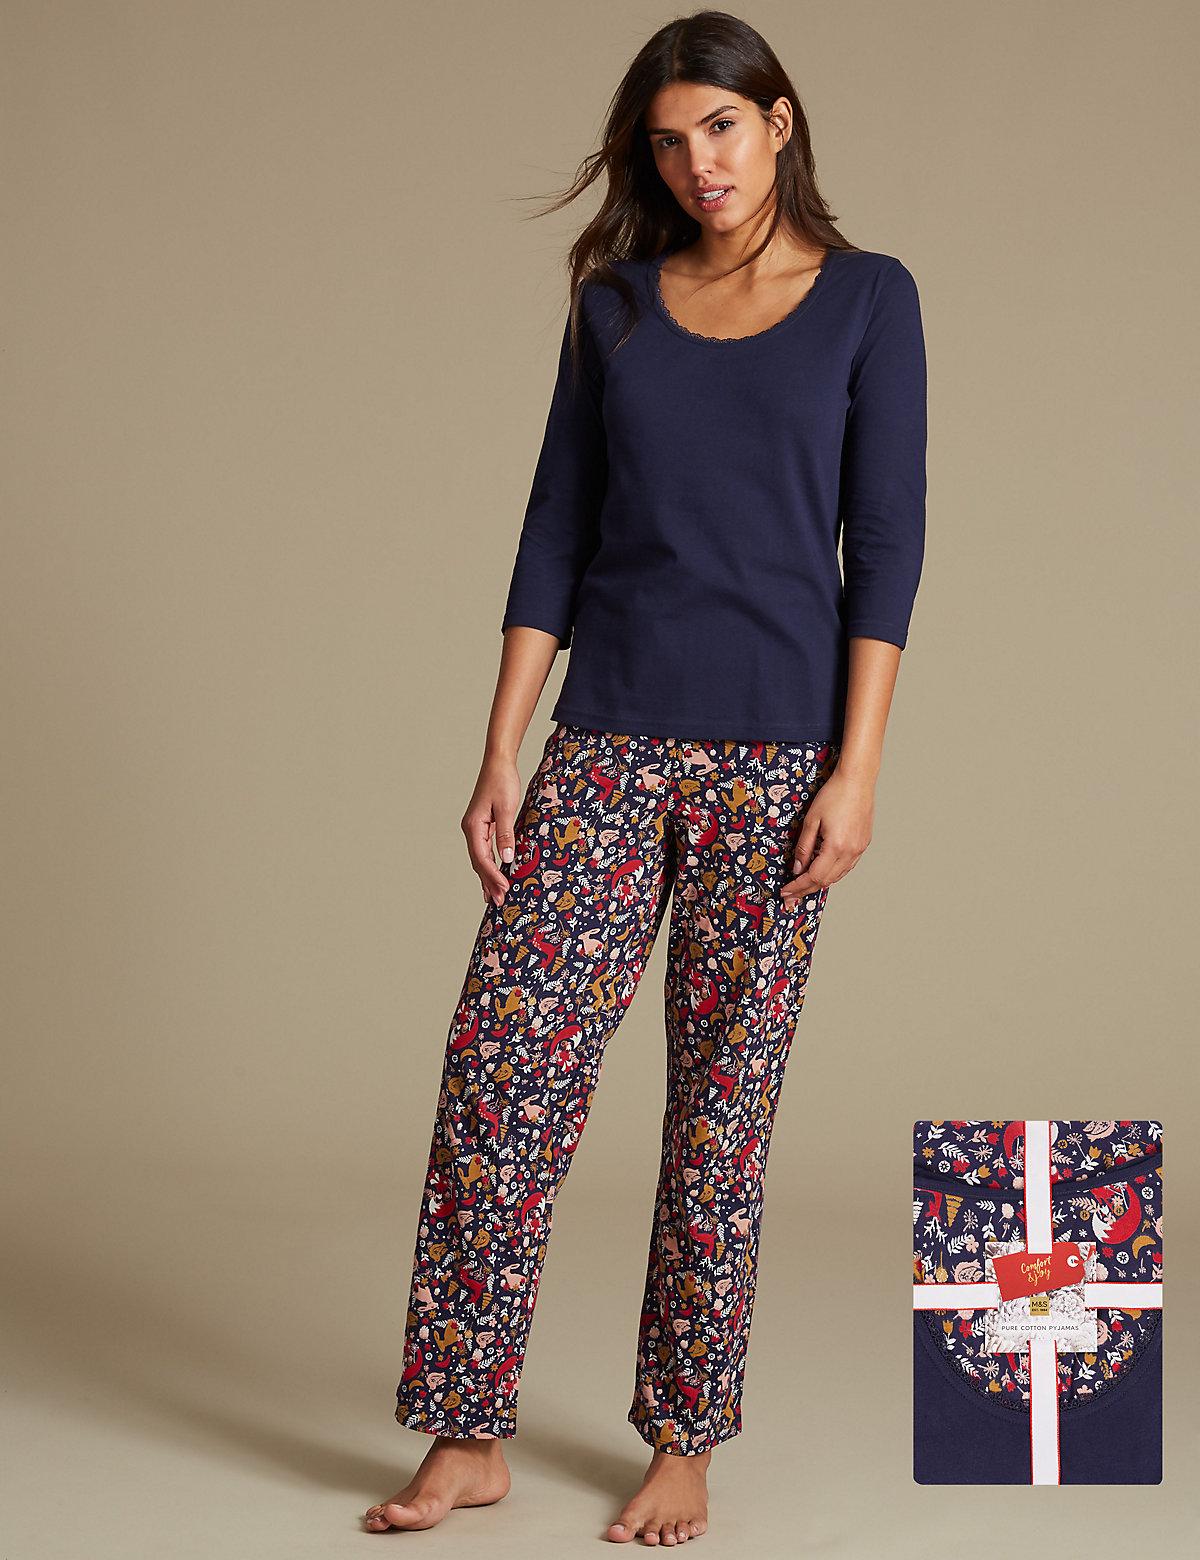 Black t shirt nightdress - Pure Cotton 3 4 Sleeve Pyjamas With Staynew Trade